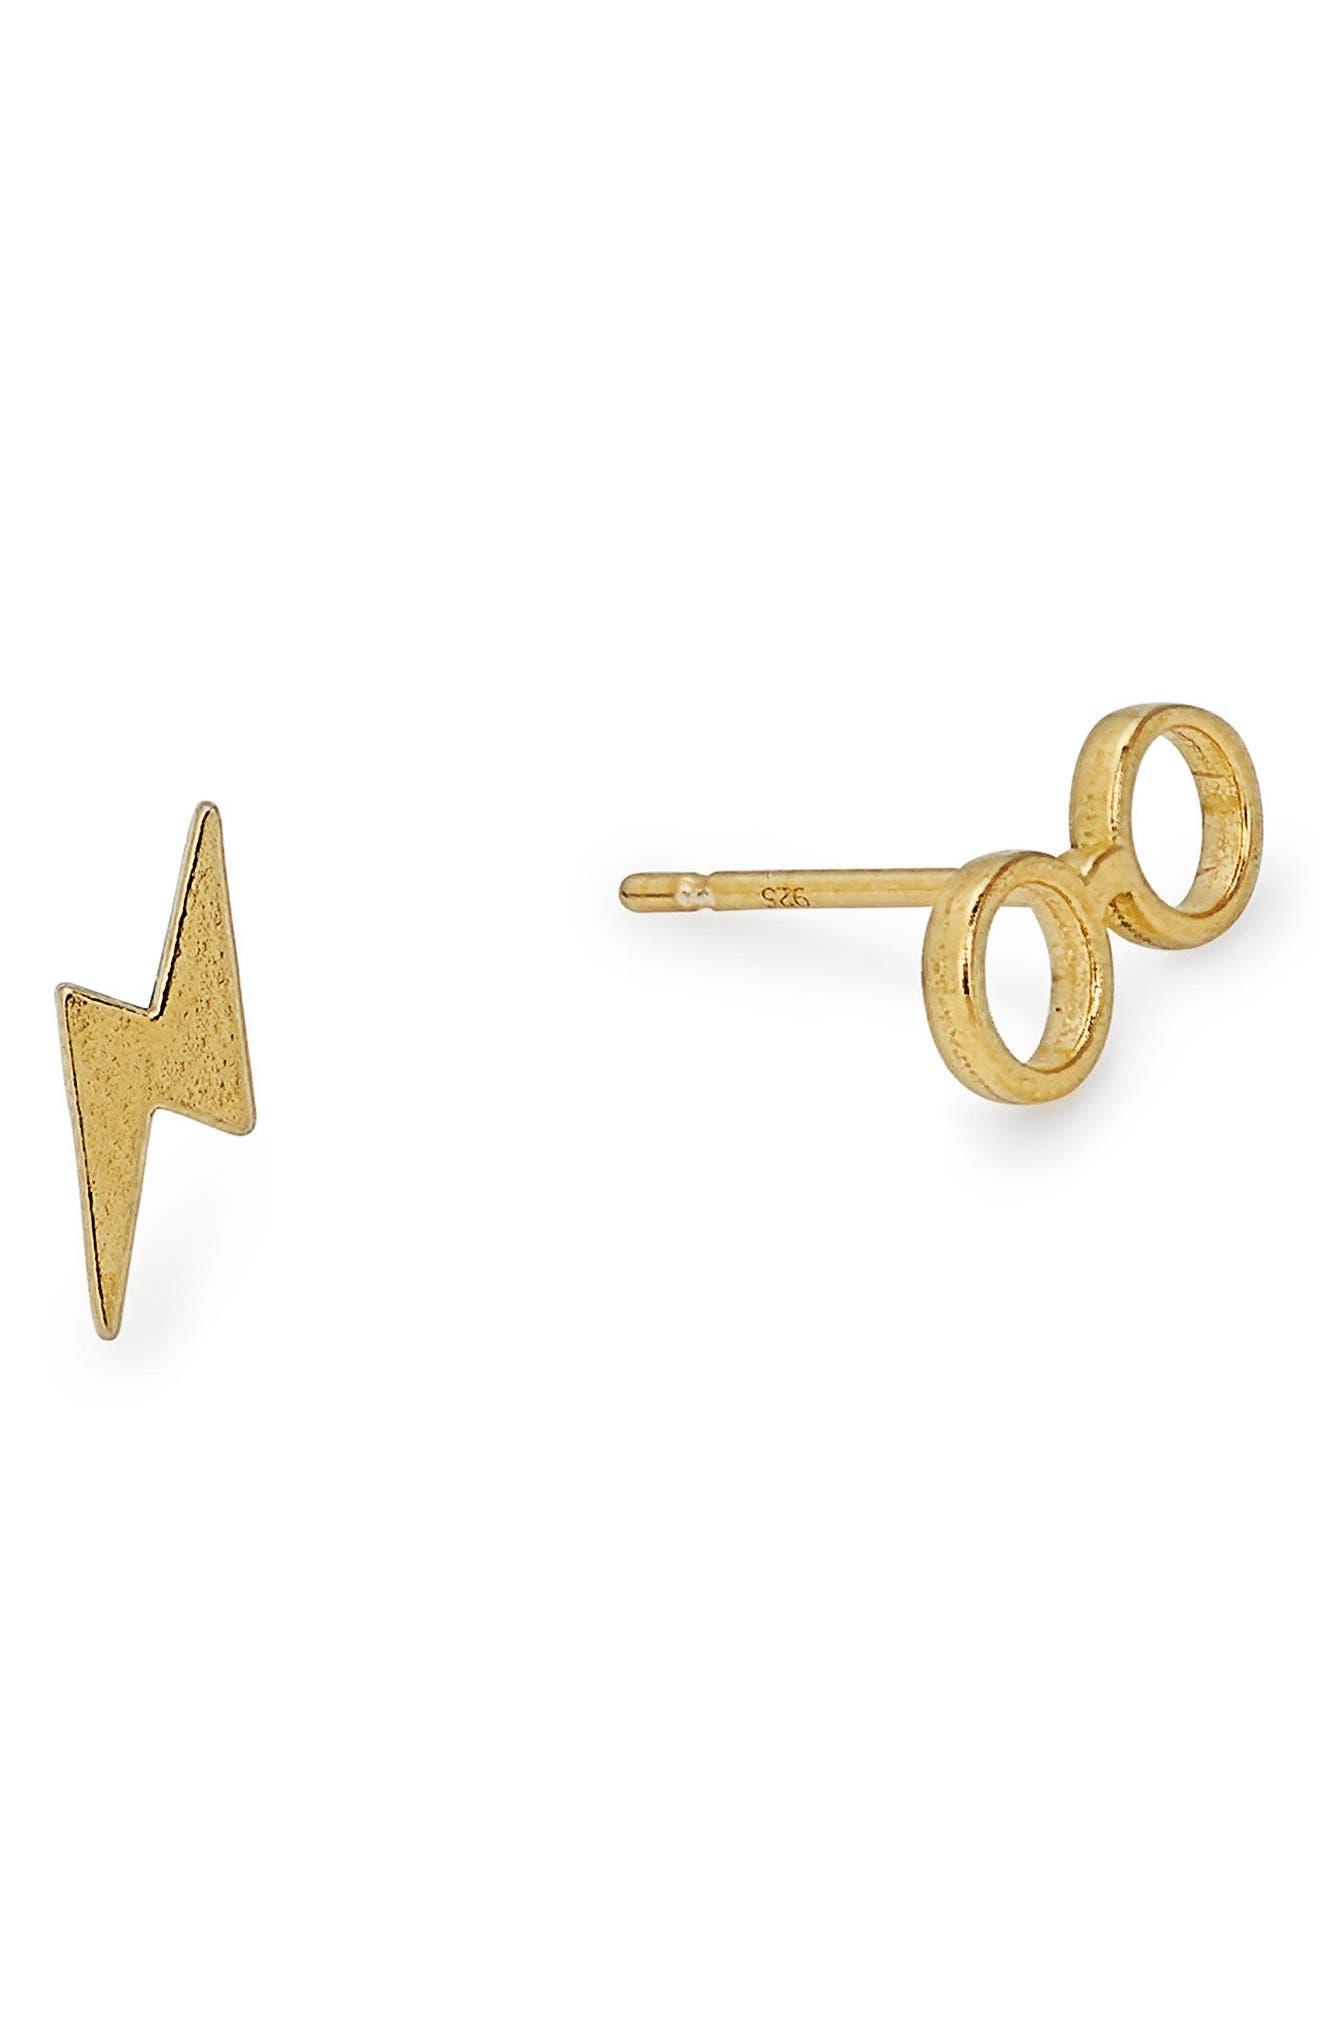 Harry Potter<sup>™</sup> Glasses & Bolt Stud Earrings,                             Main thumbnail 1, color,                             Gold